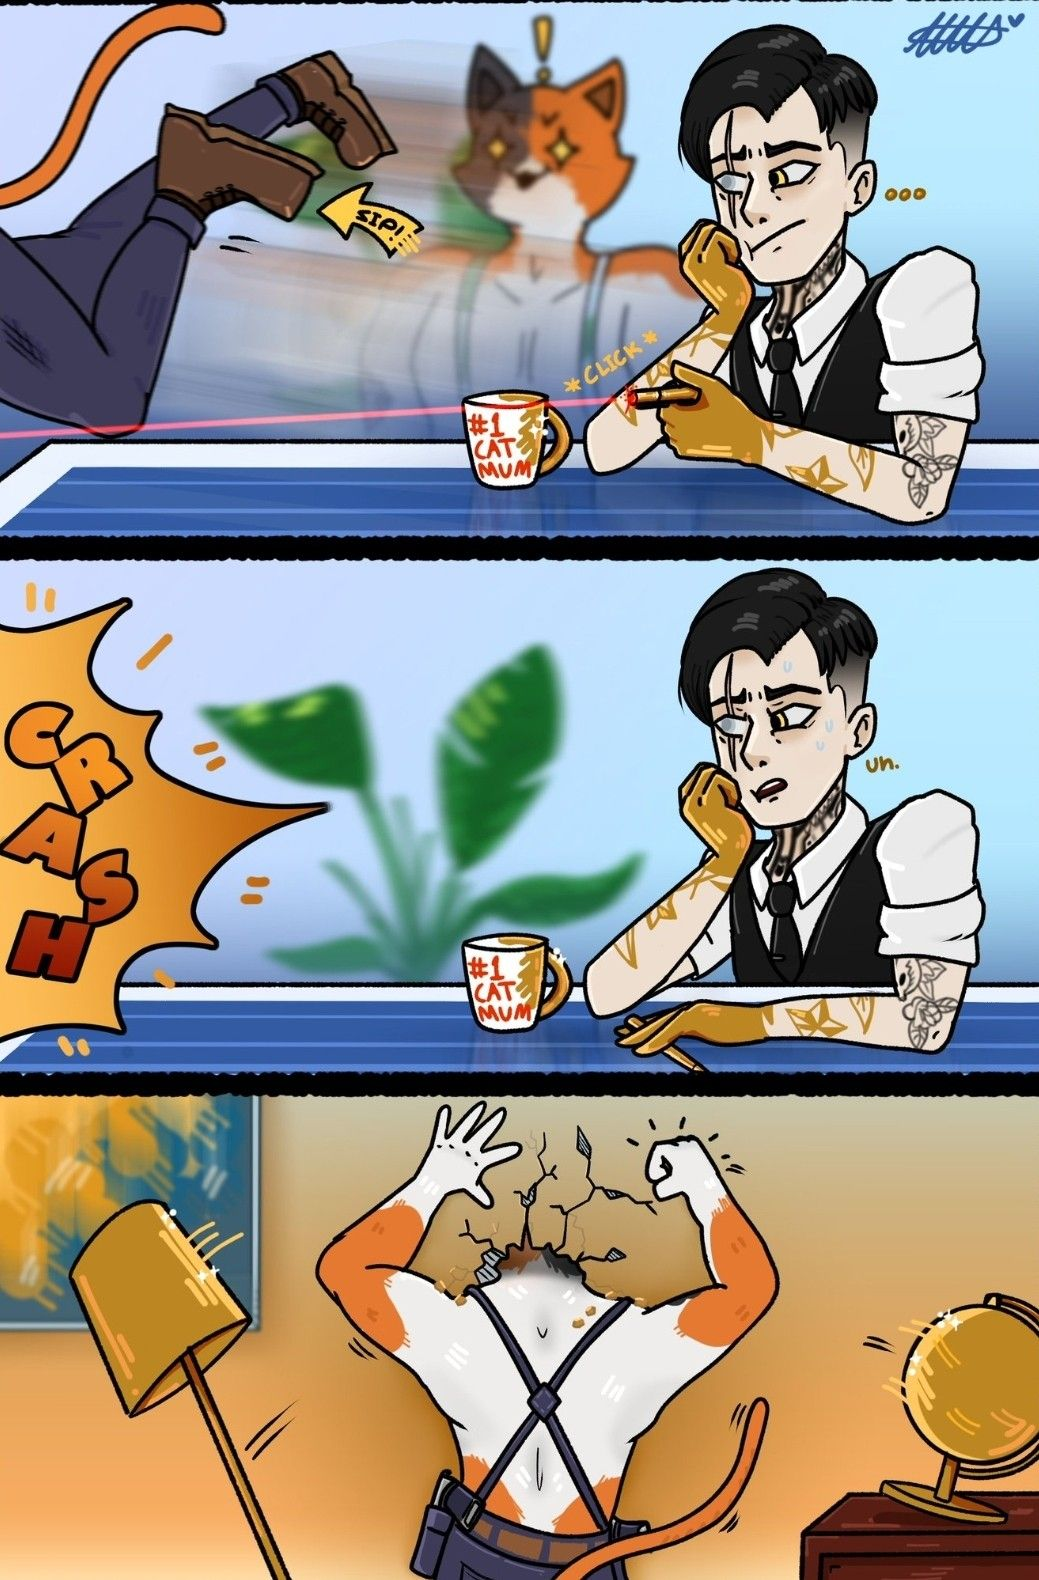 Pin By Luis Fernando Sarabia Corona On Fortnite Funny Art Memes Gamer Pics Funny Art